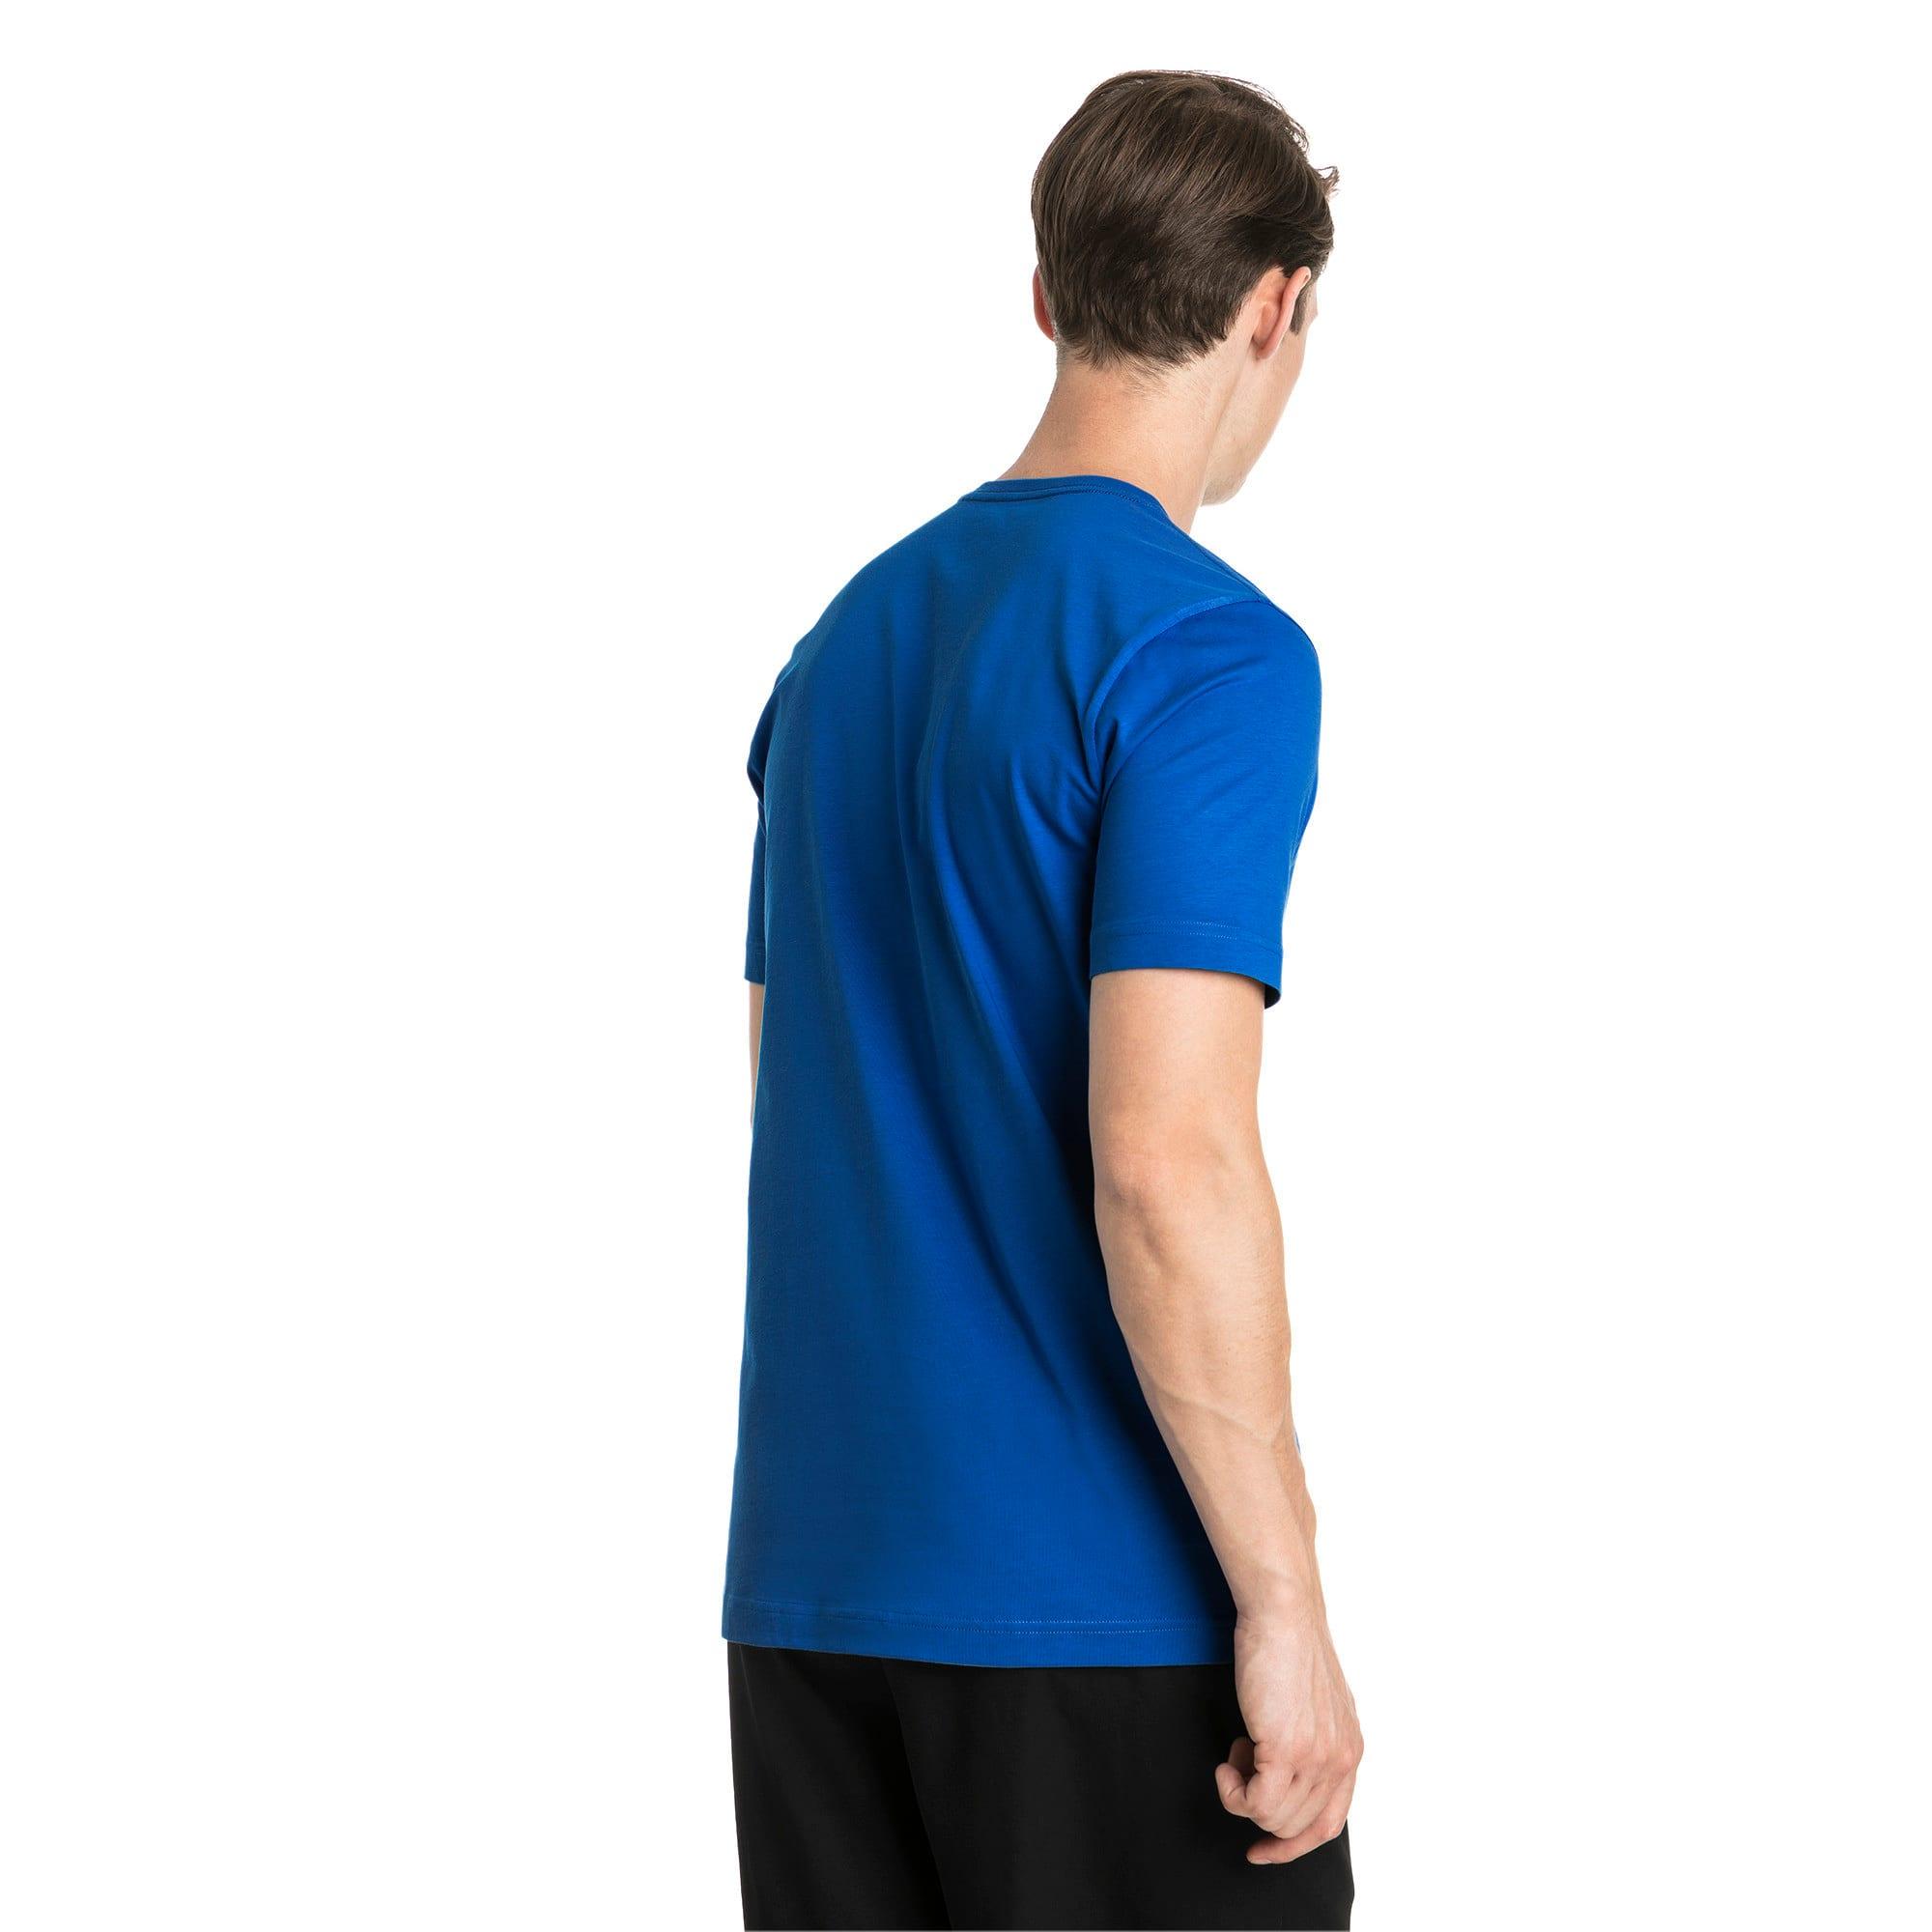 Thumbnail 2 of T-shirt a maniche corte Essentials uomo, Puma Royal, medium